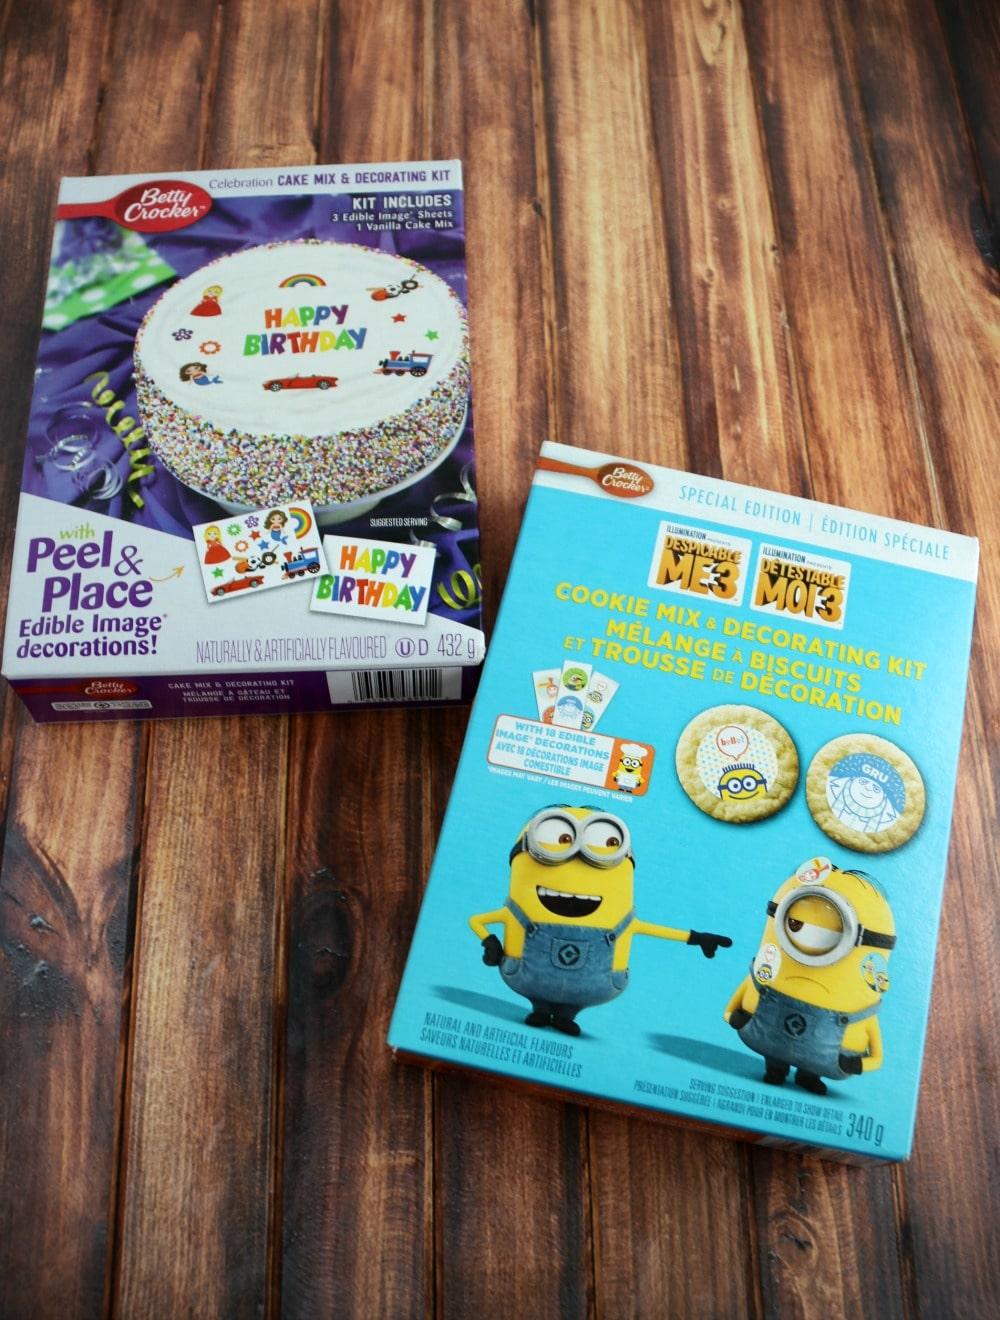 Betty Crocker Edible Image Kits